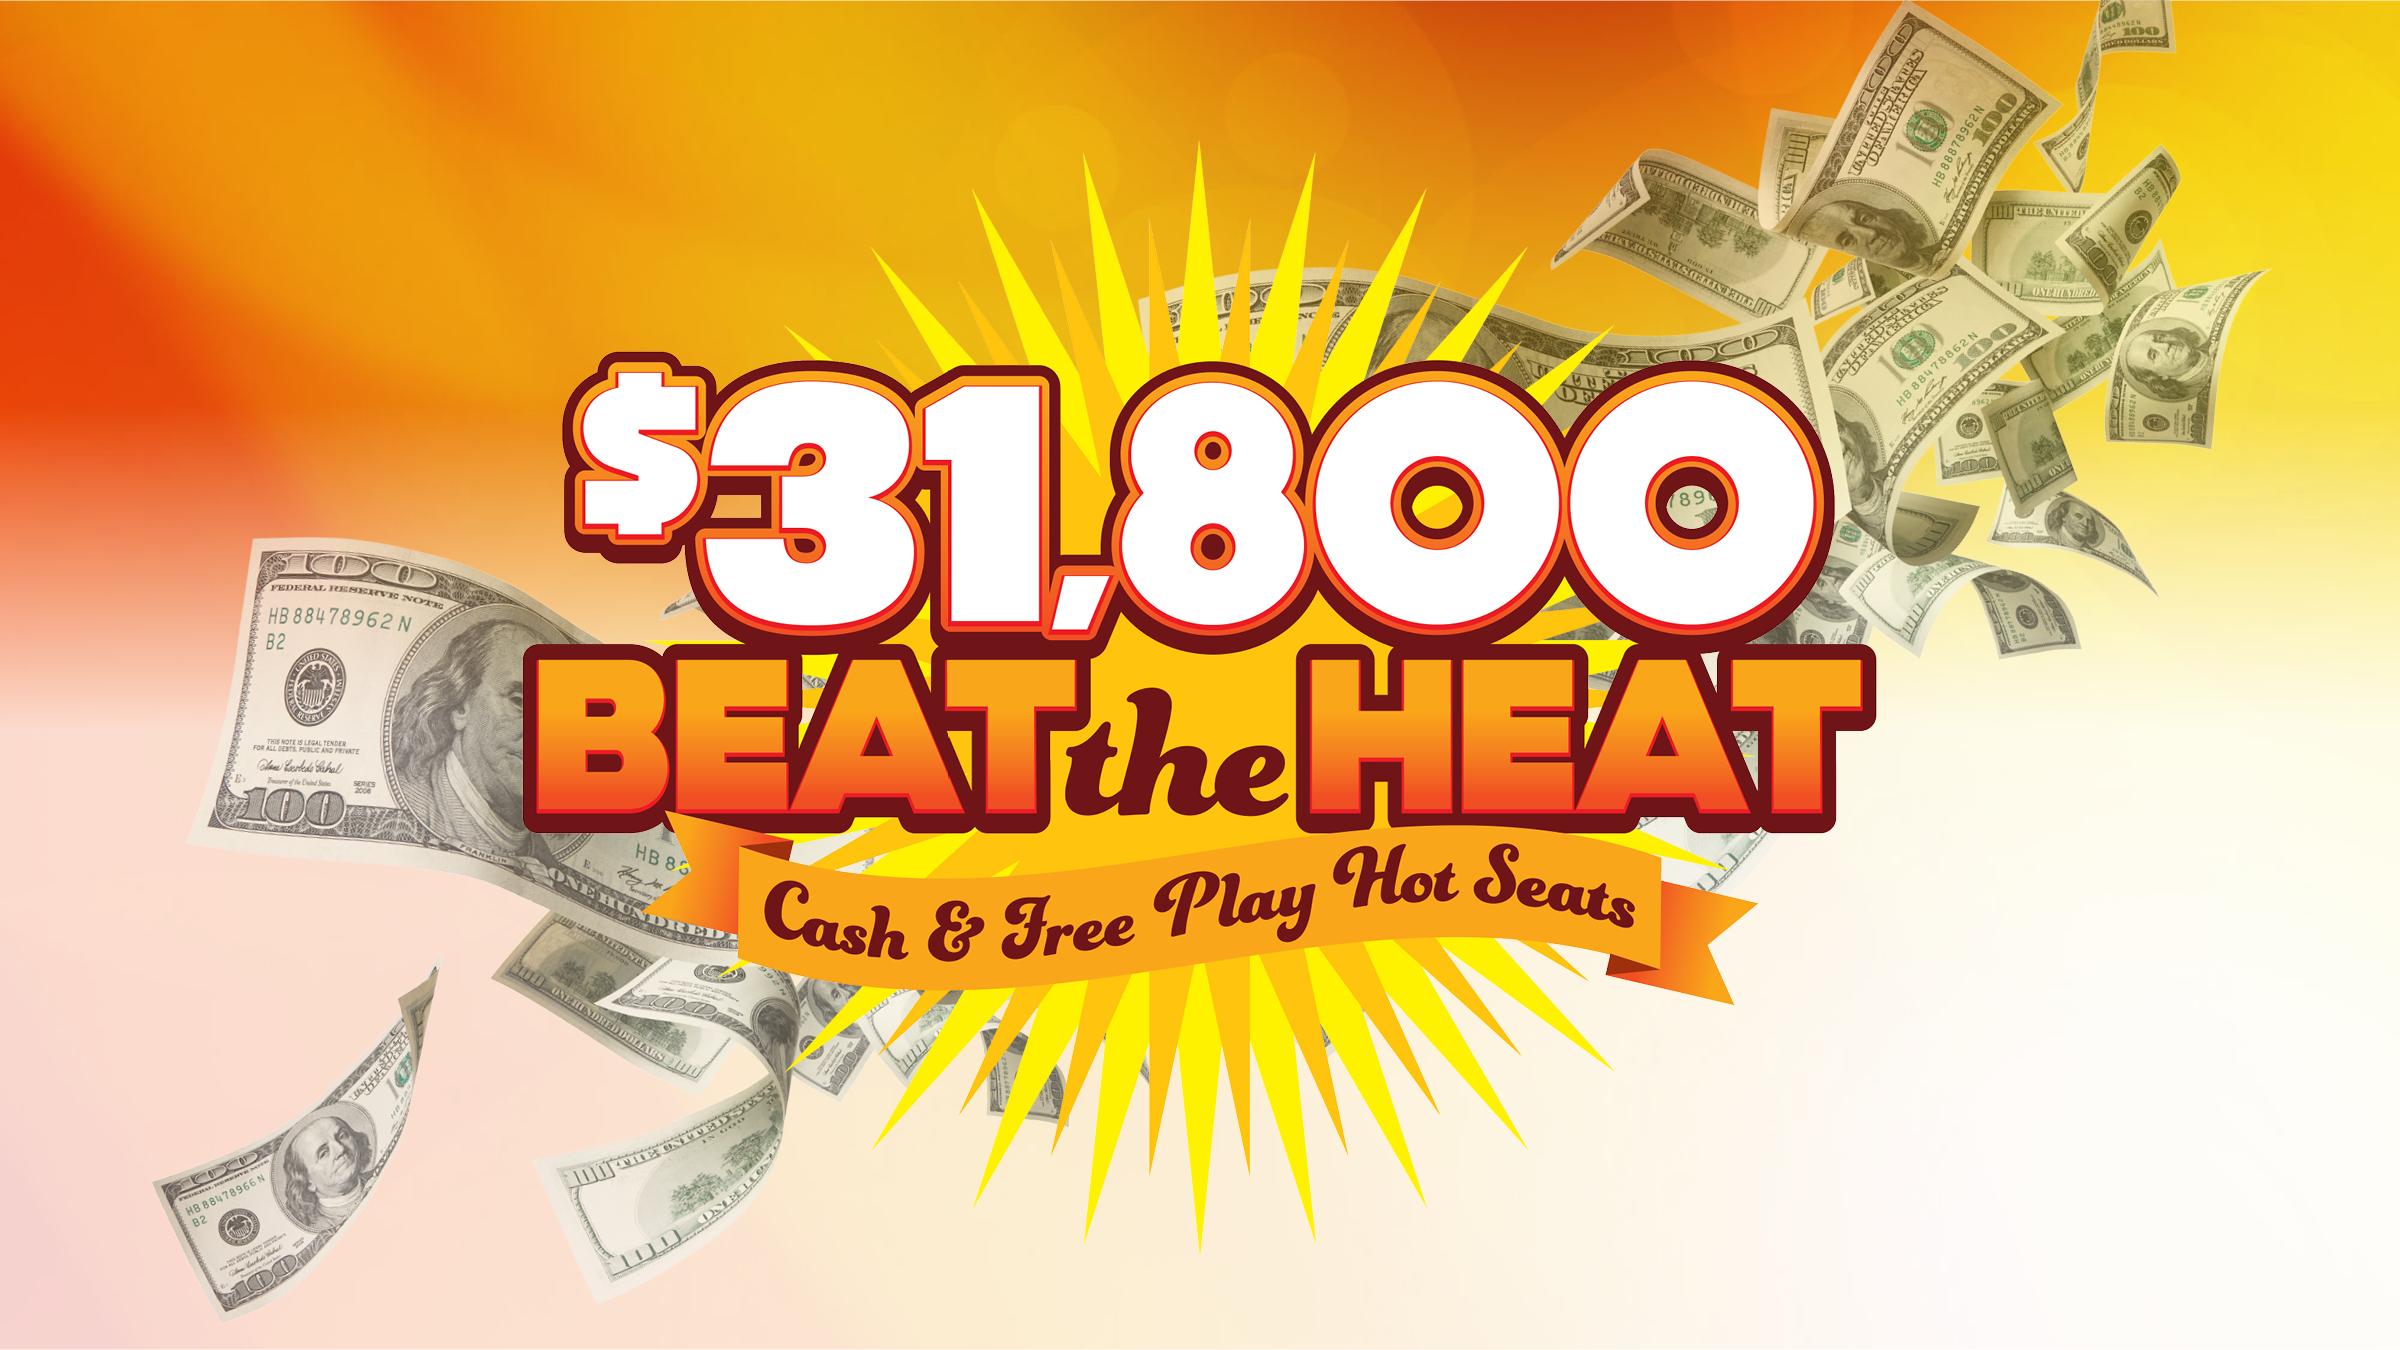 Beat the Heat Cash & Free Play Hot Seats